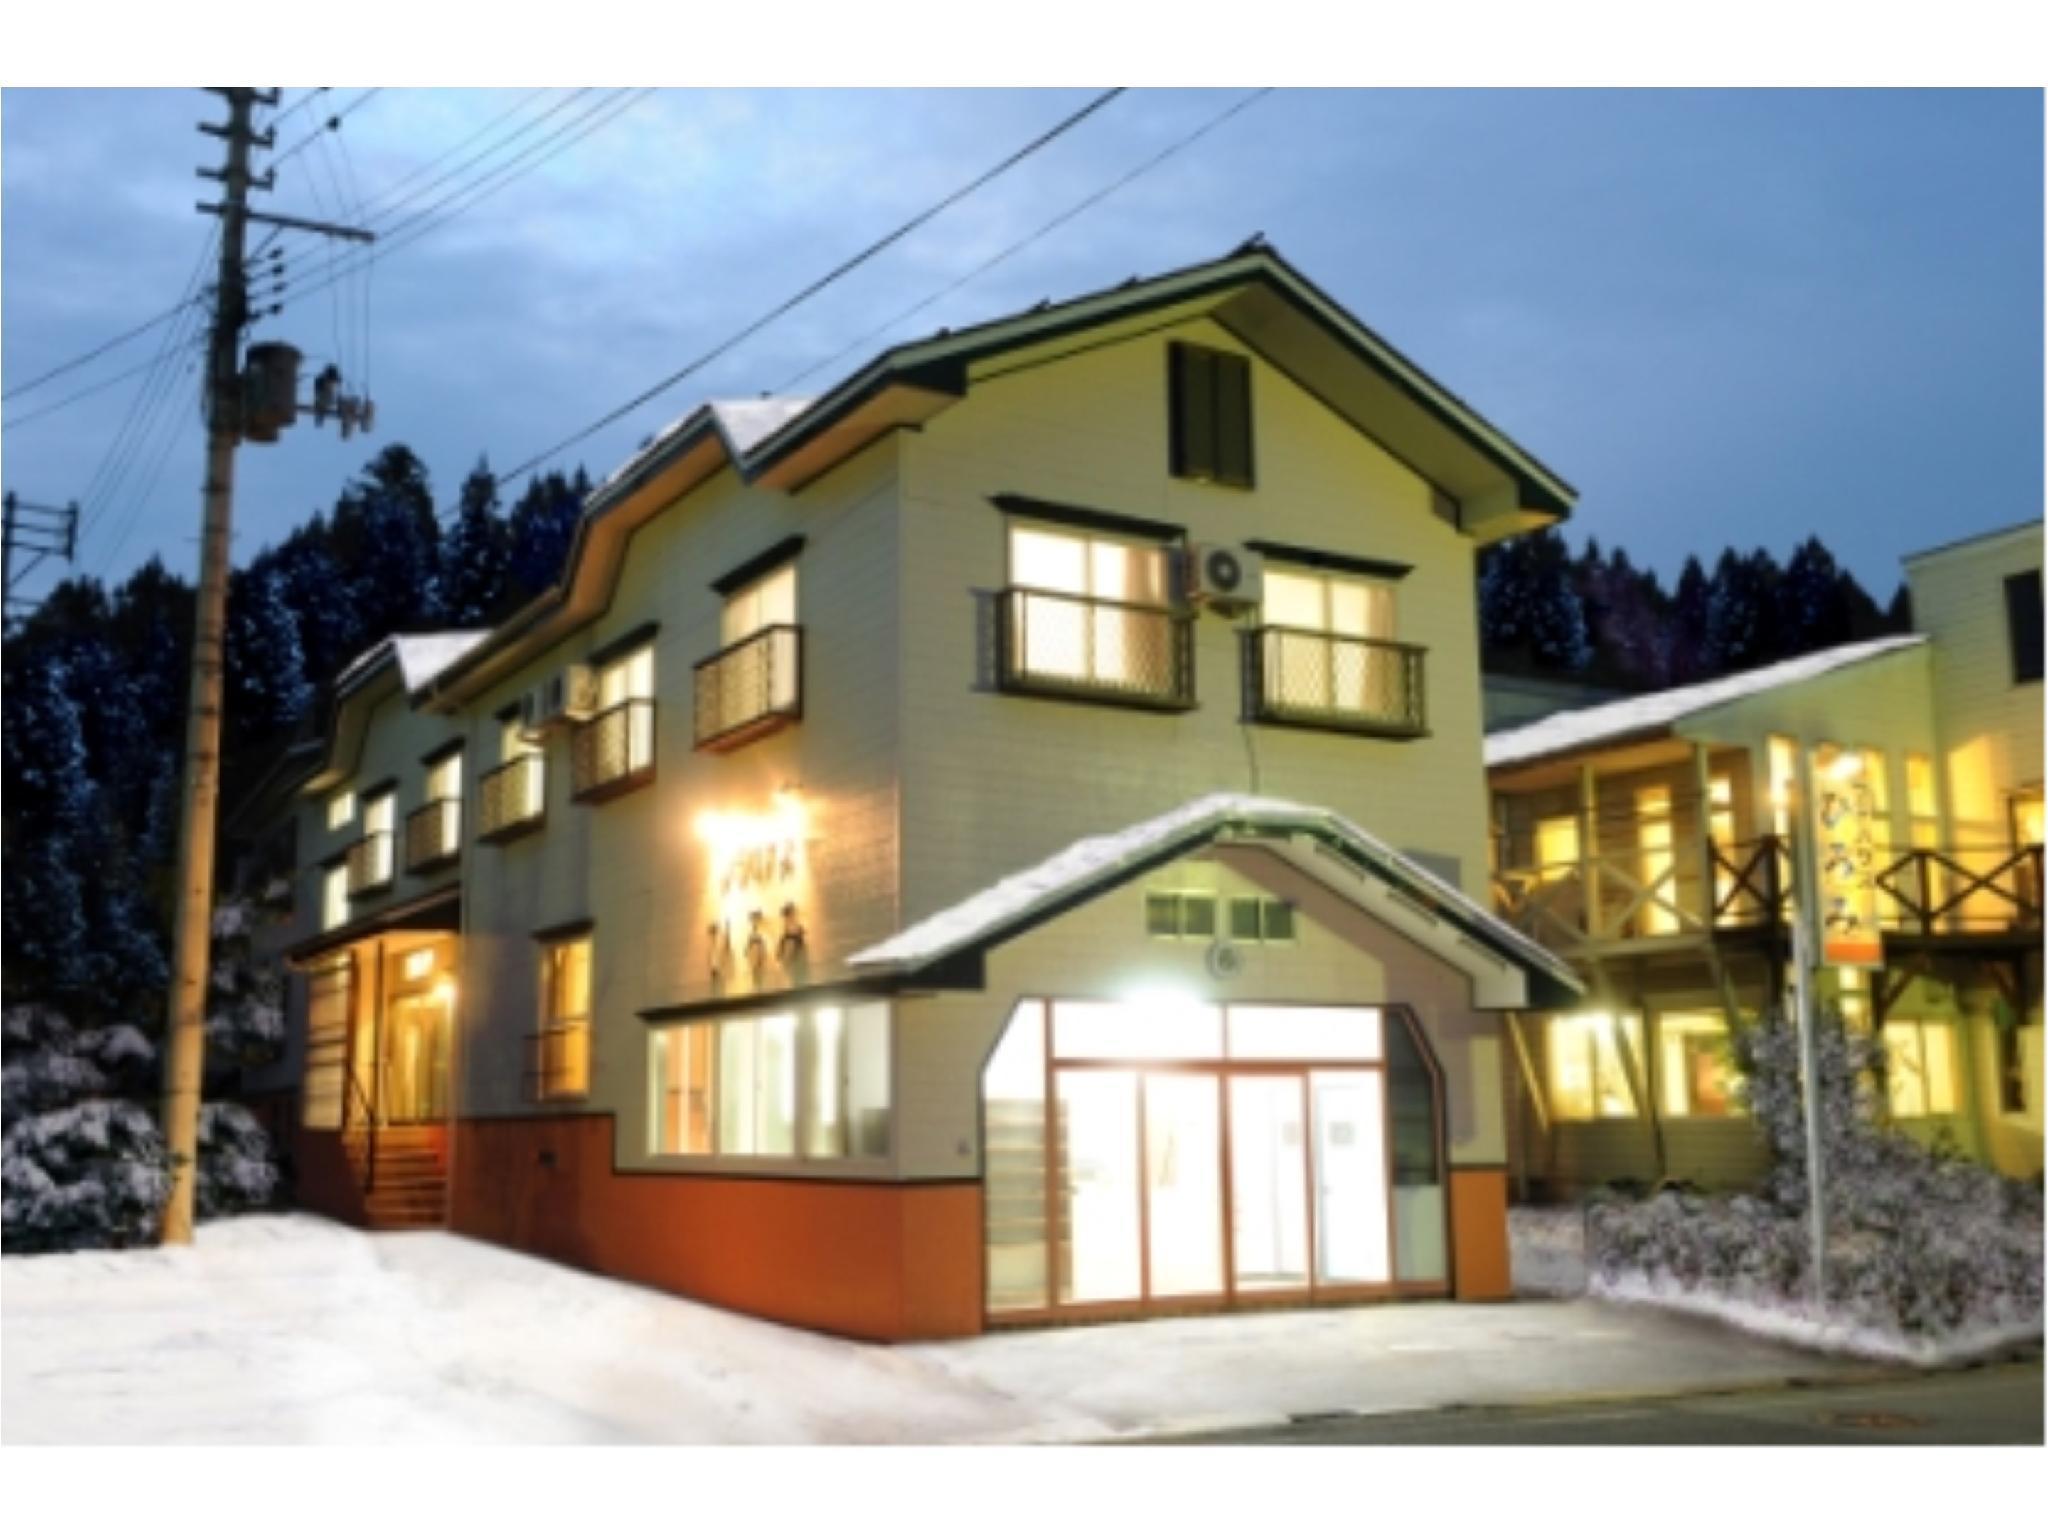 Petit House Hiromi